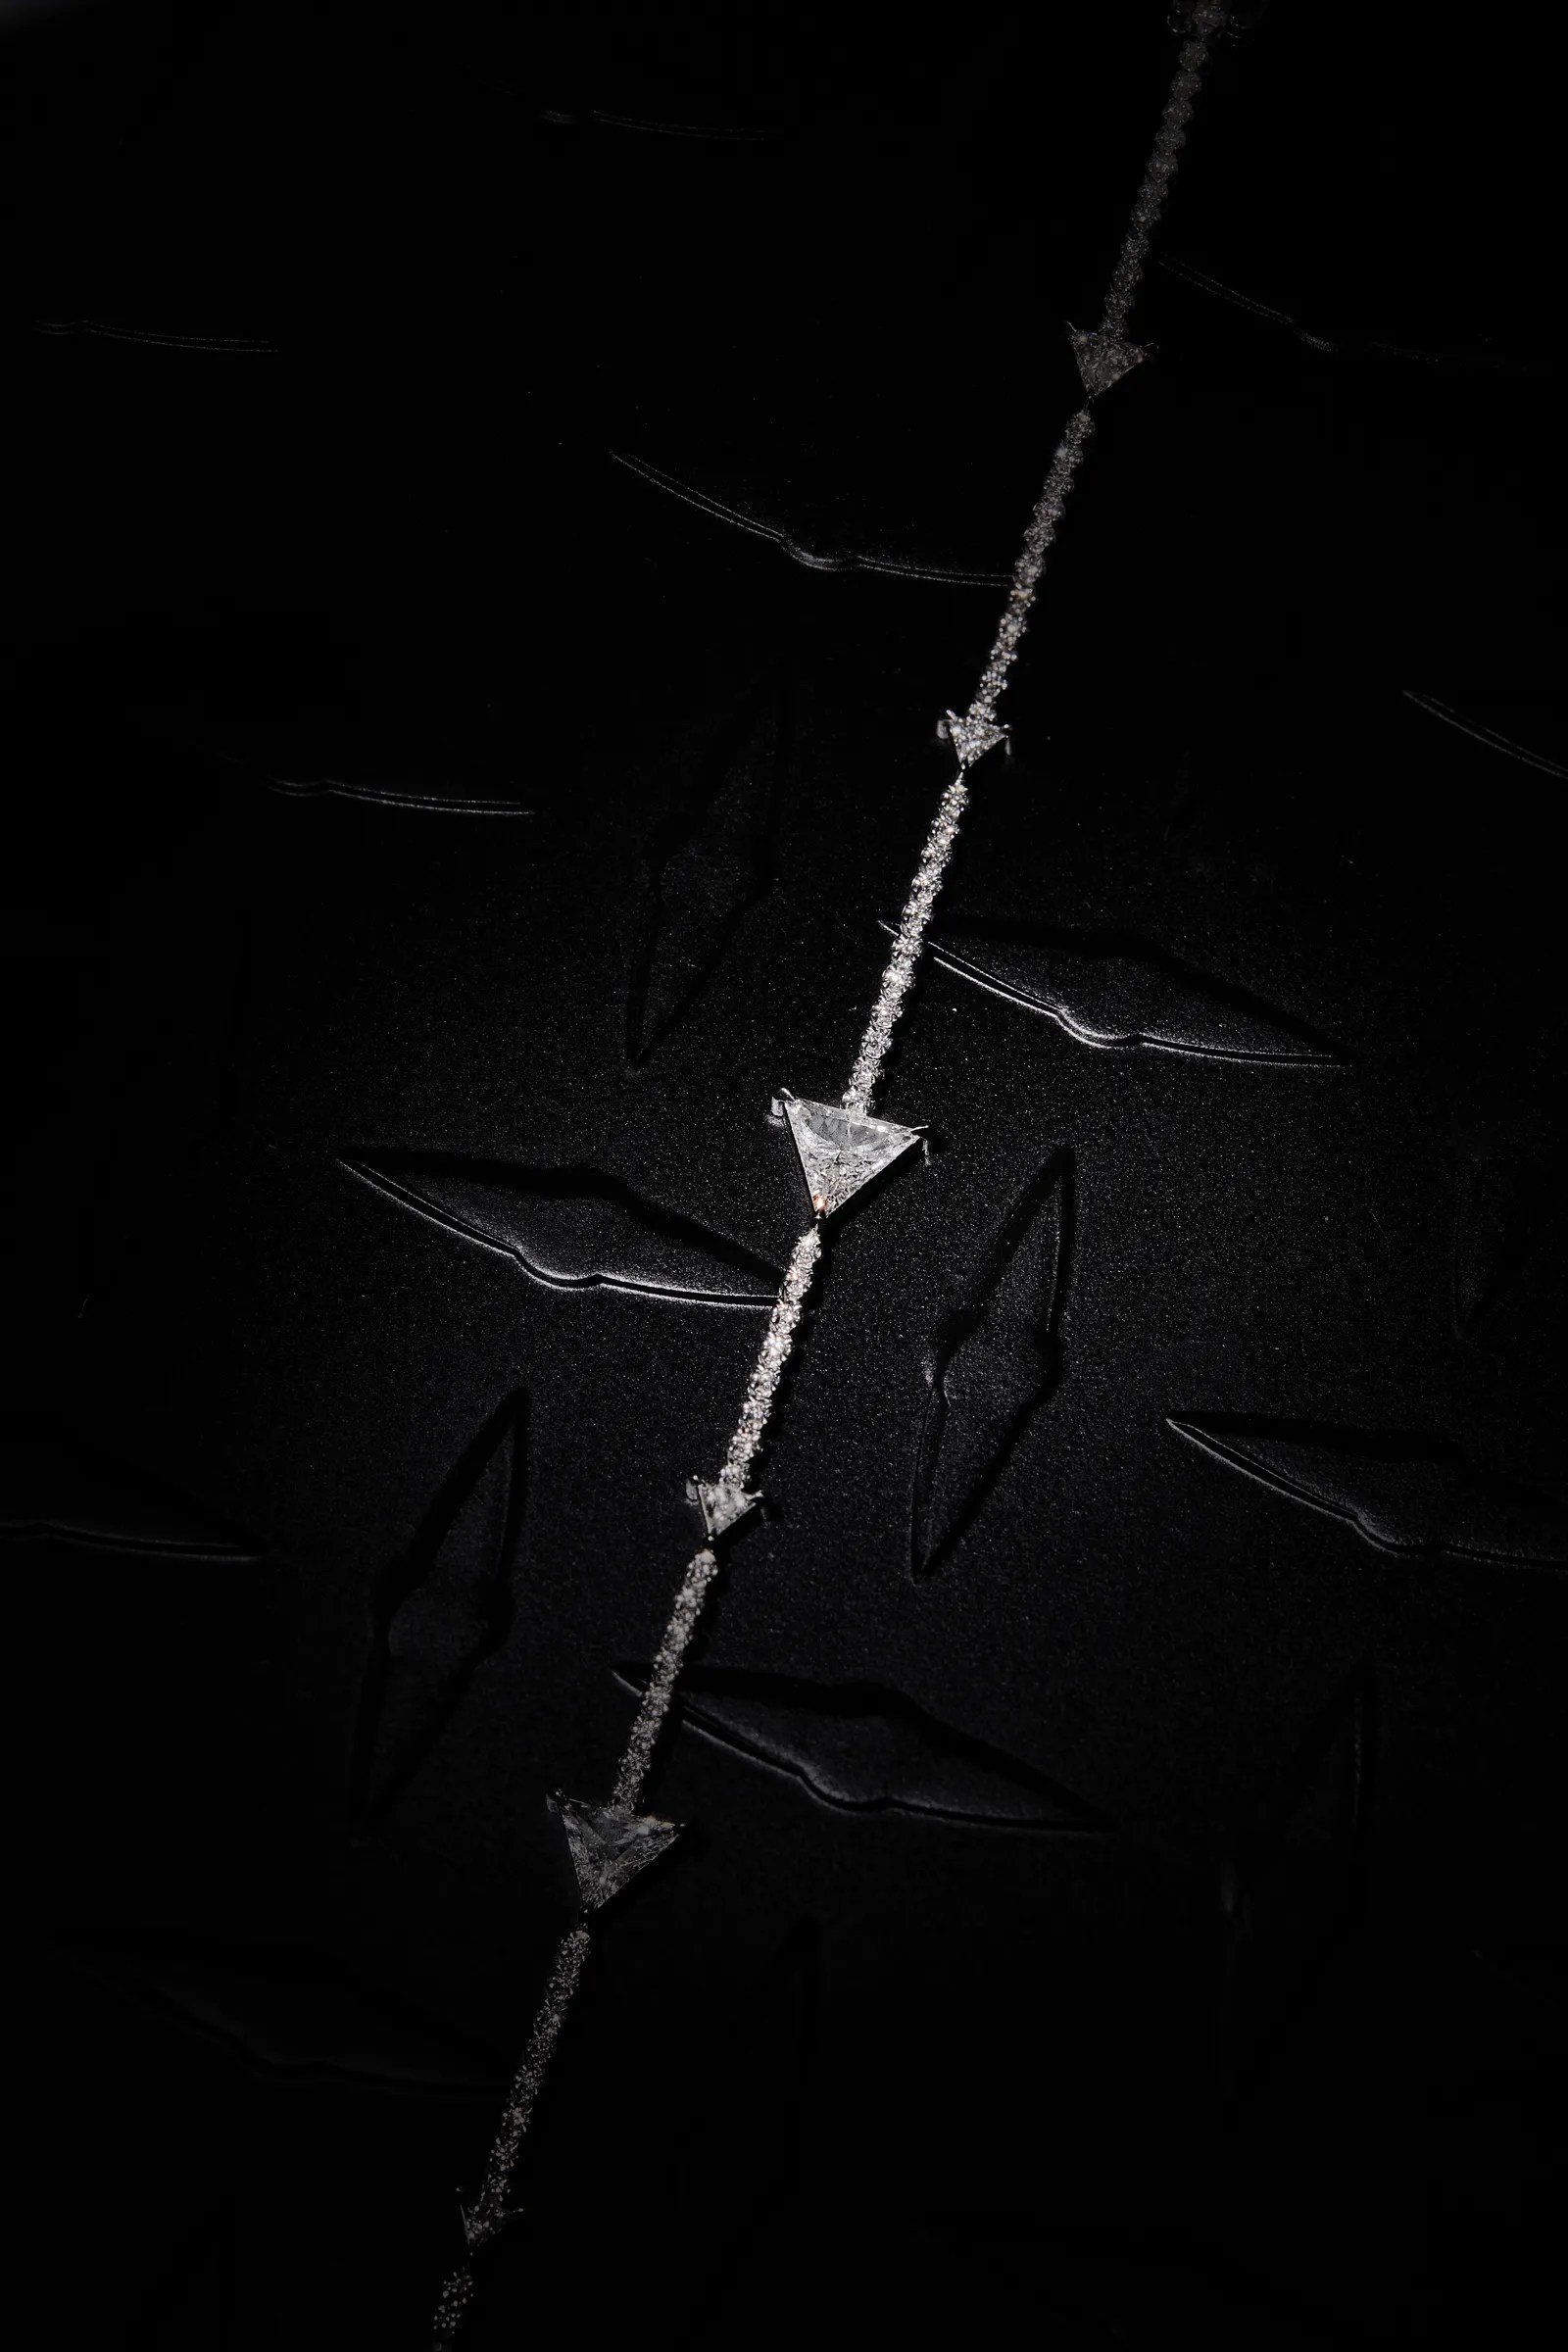 A bracelet from Eva Fehren's new collection